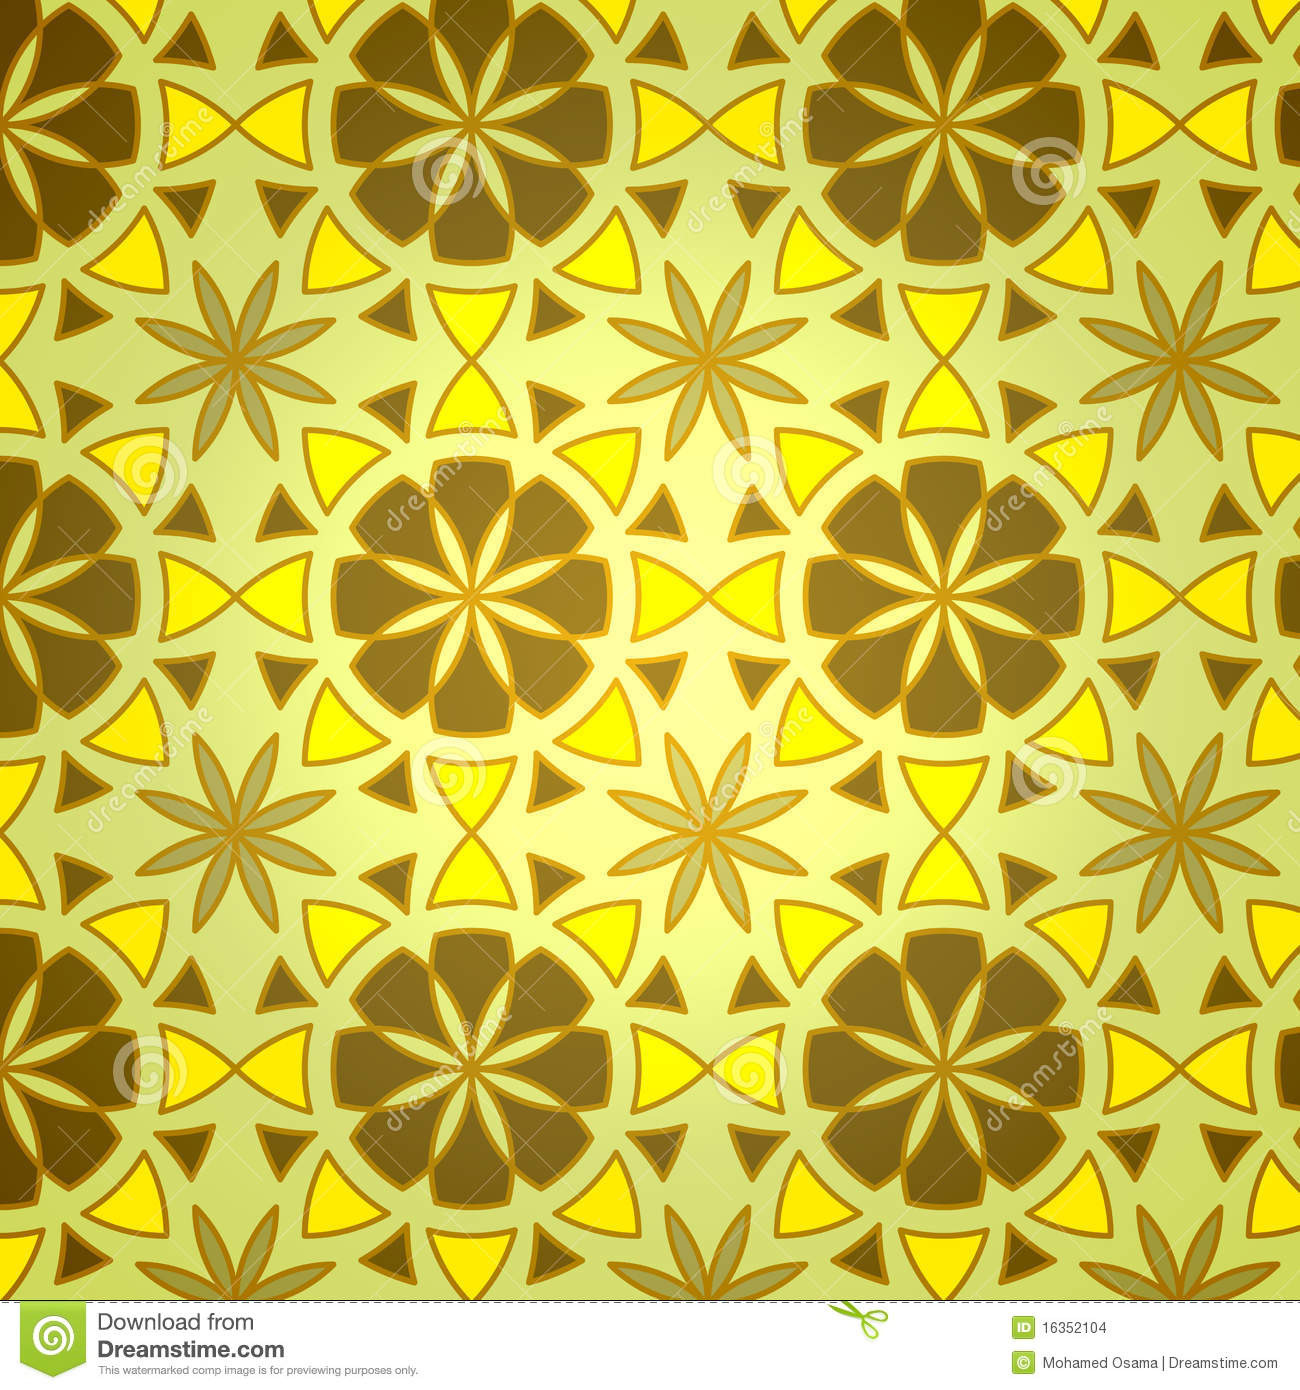 Simple Geometric Flower Patterns